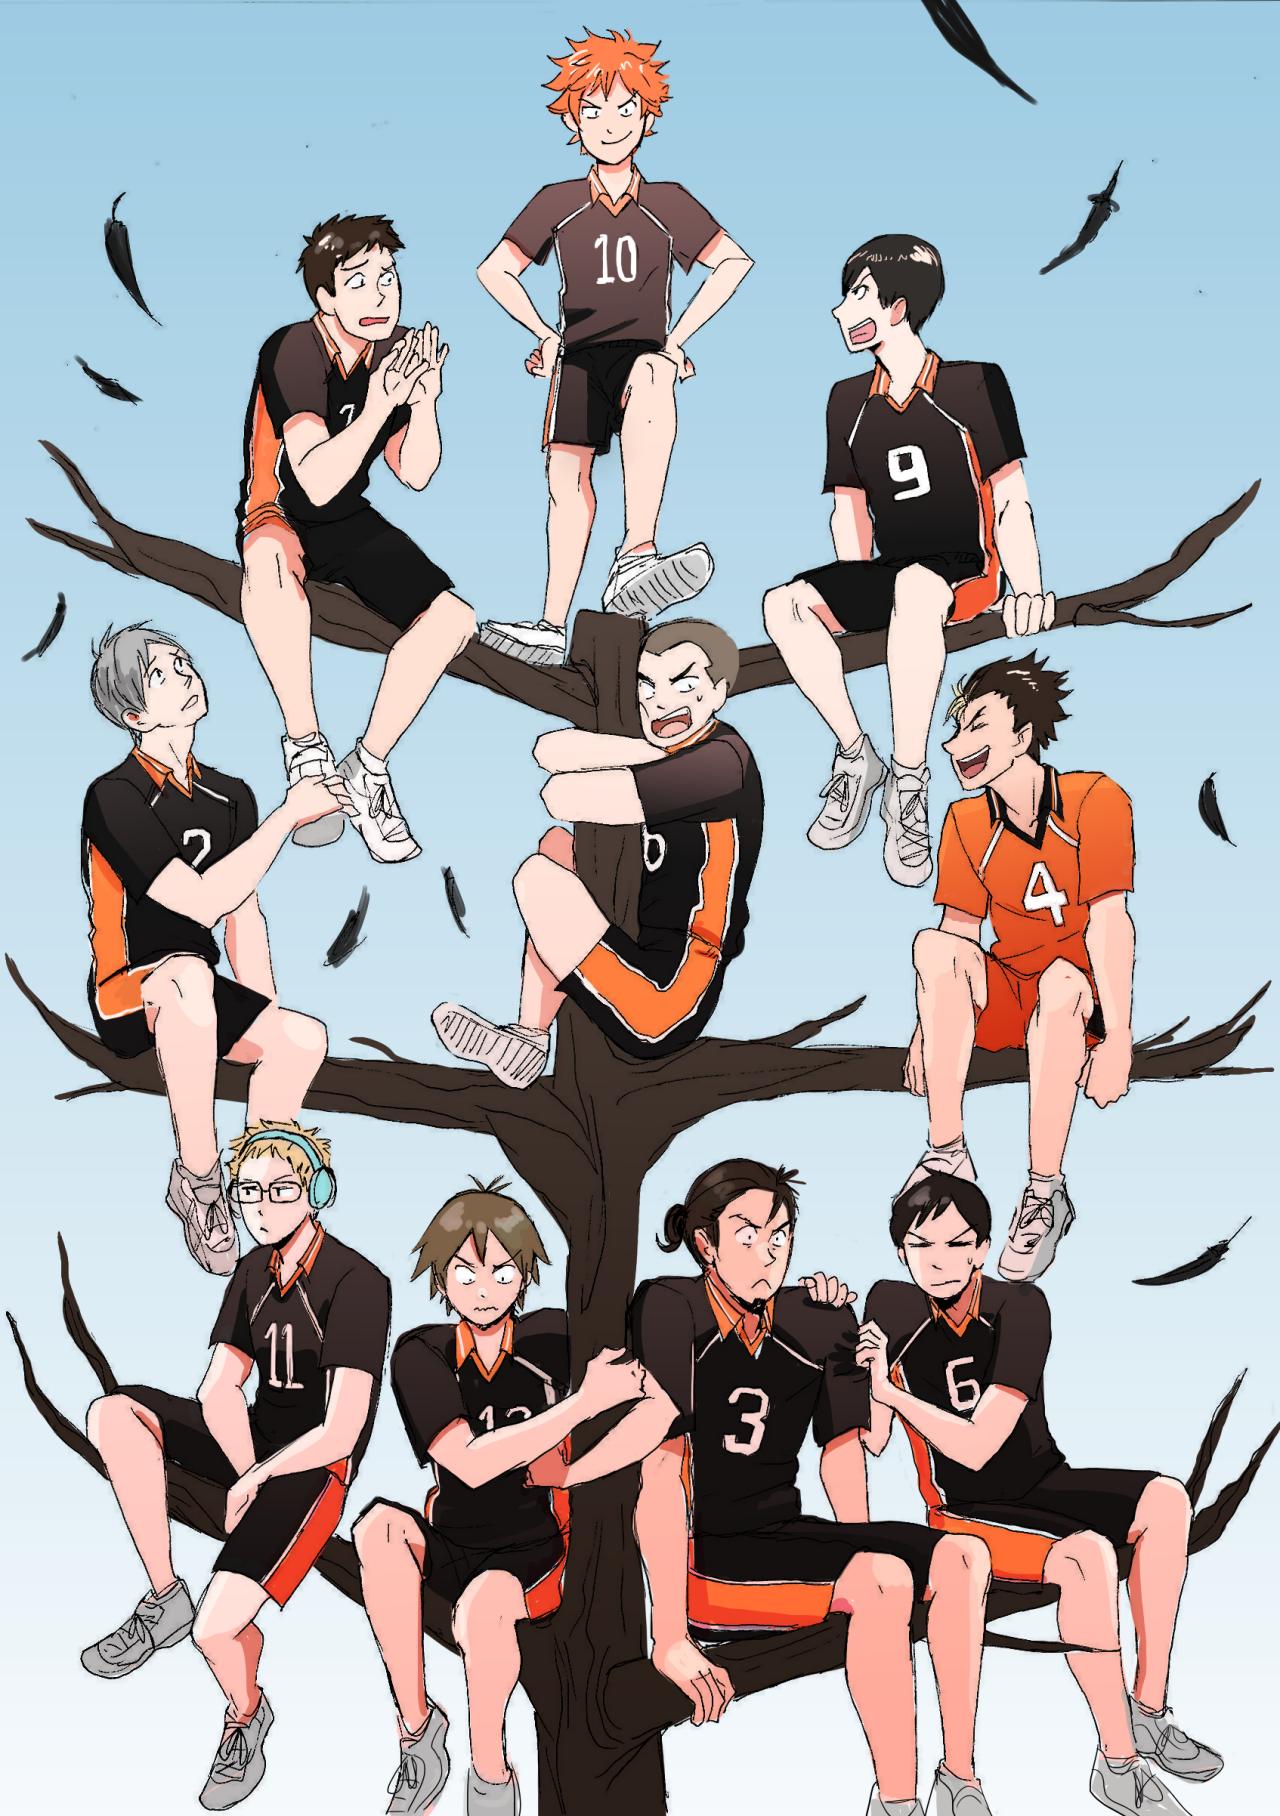 Haikyuu Karasuno High School Volleyball Club Haikyuu Karasuno Haikyuu Anime Haikyuu